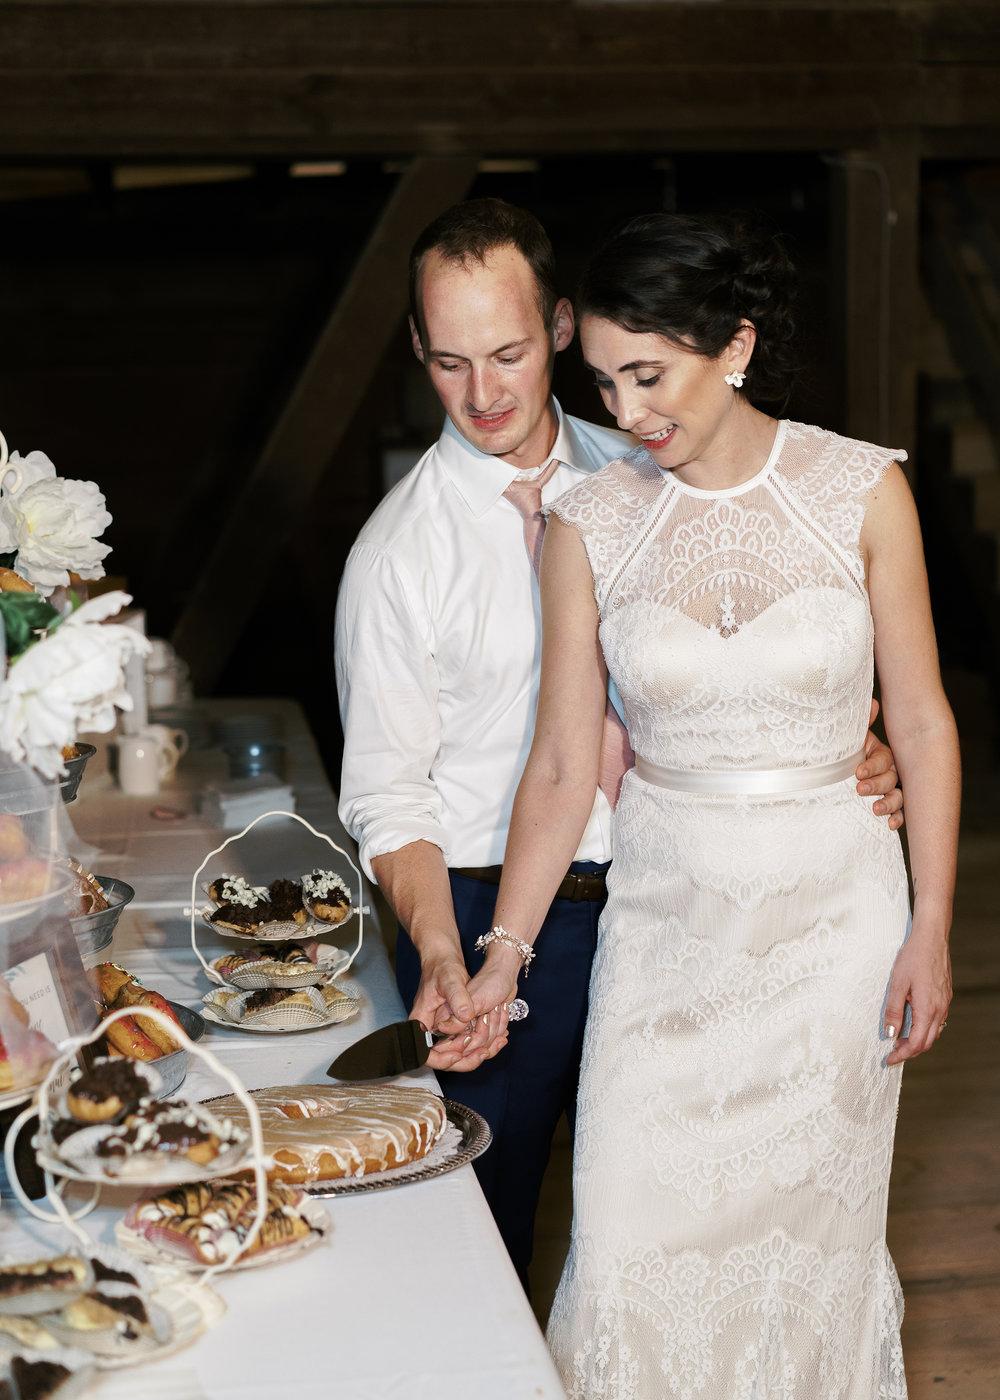 Vicki_Grafton_Photography_wedding-748.jpg